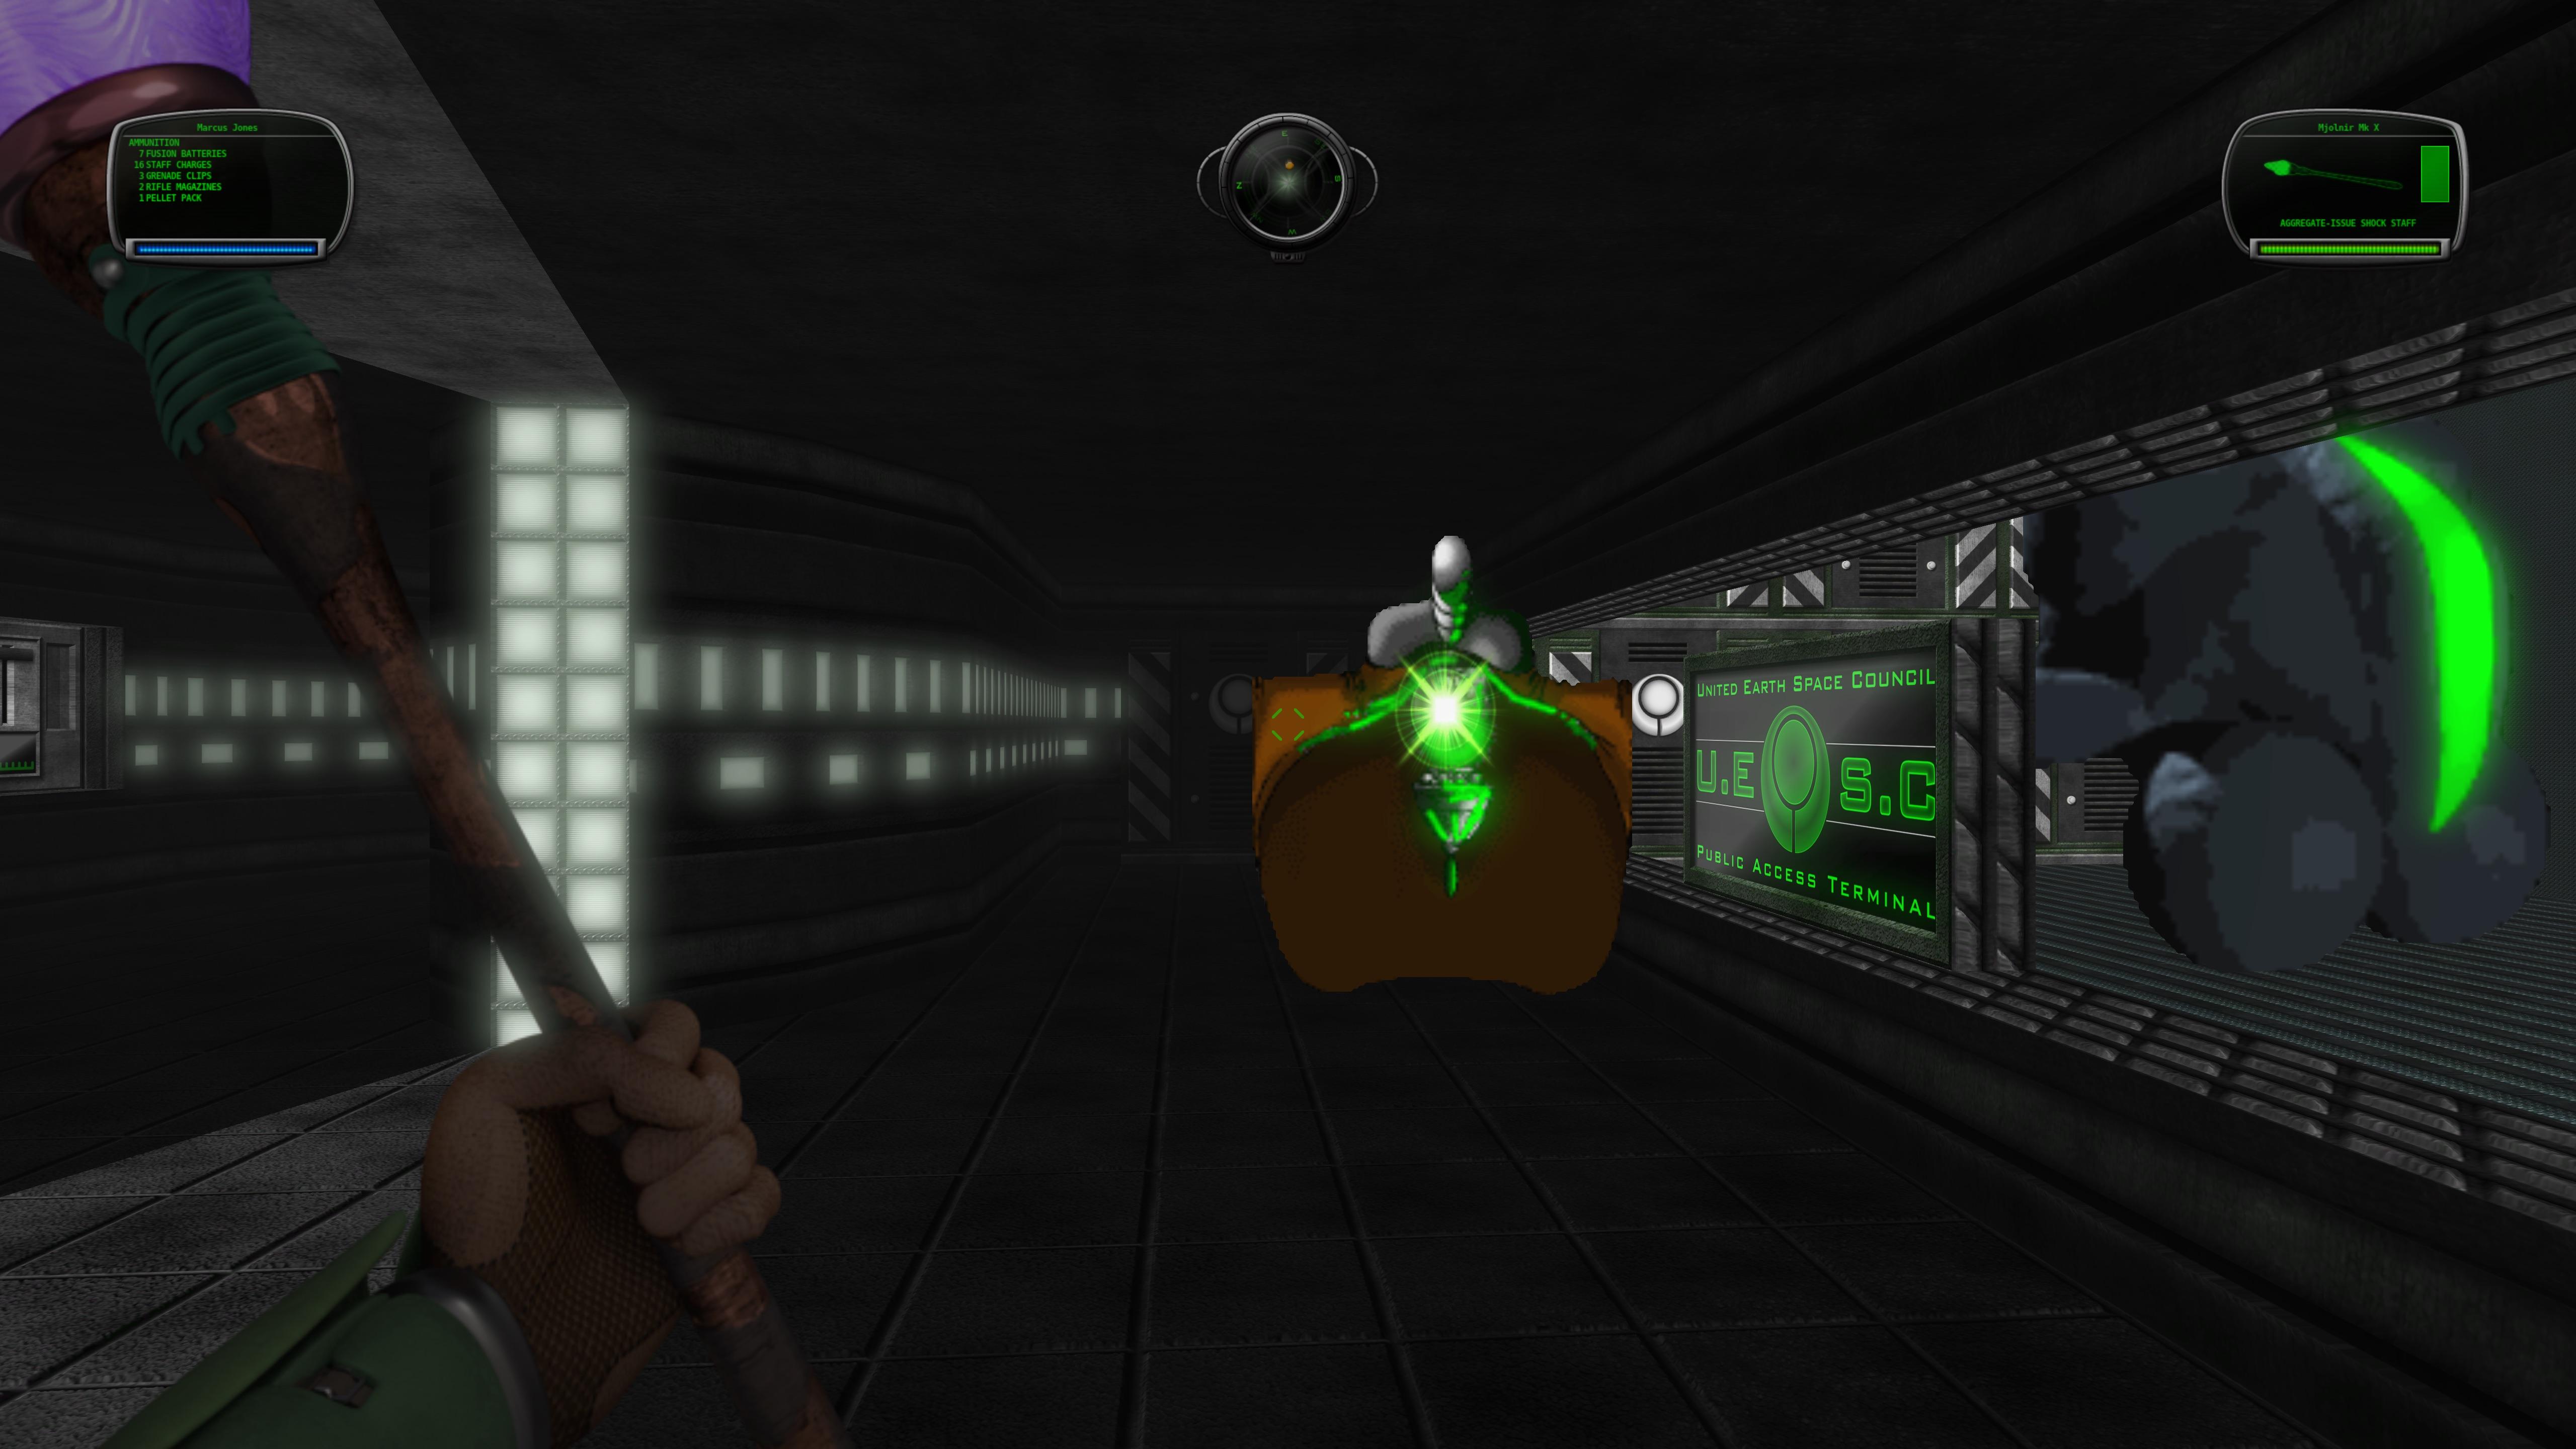 <i>Eternal</i> level 8 screenshot 1